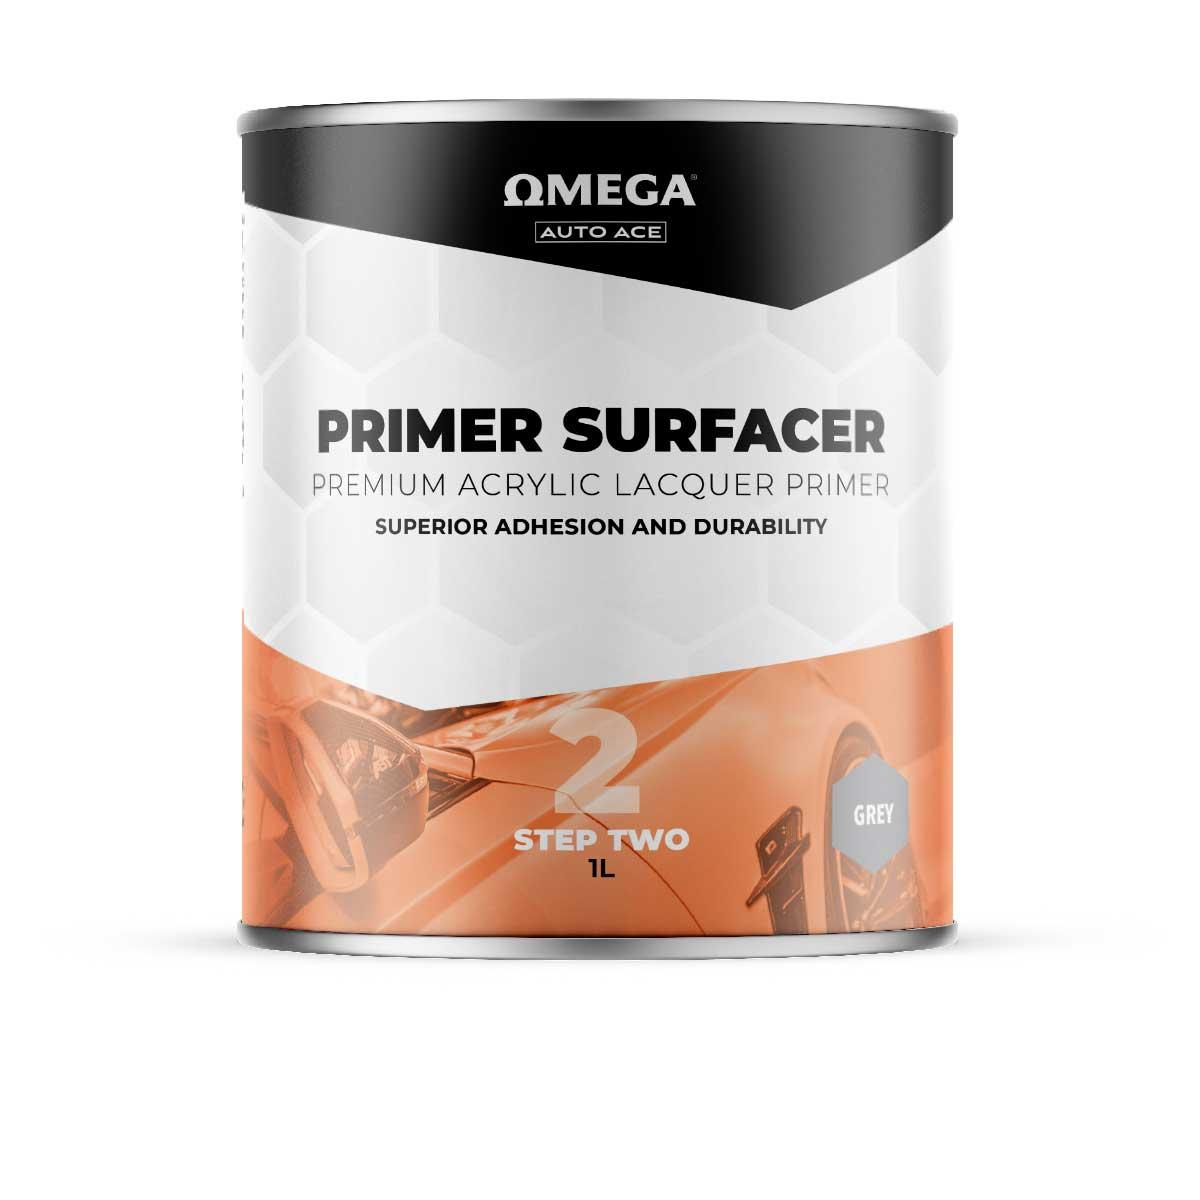 Omega Auto Ace Acrylic Primer Surfacer Grey 1lt